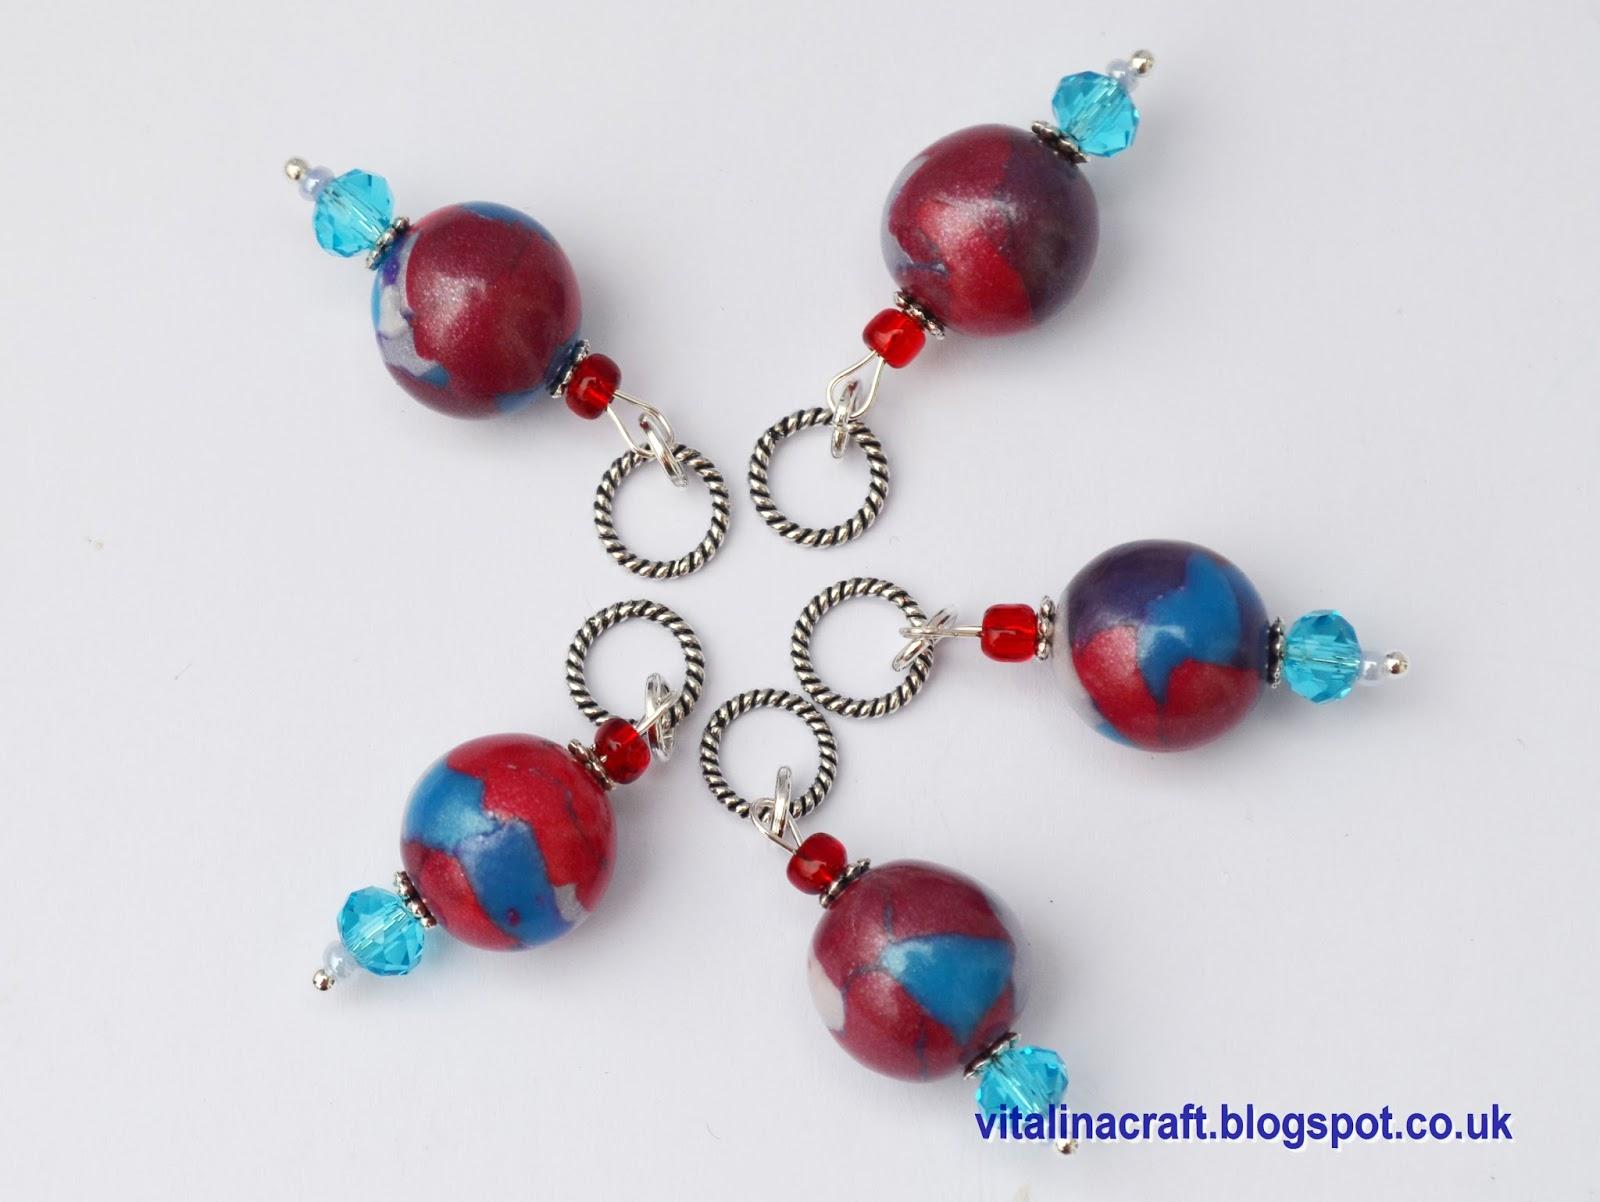 Knitting Markers Beads : Handmade fimo stitch markers and beads vitalina craft